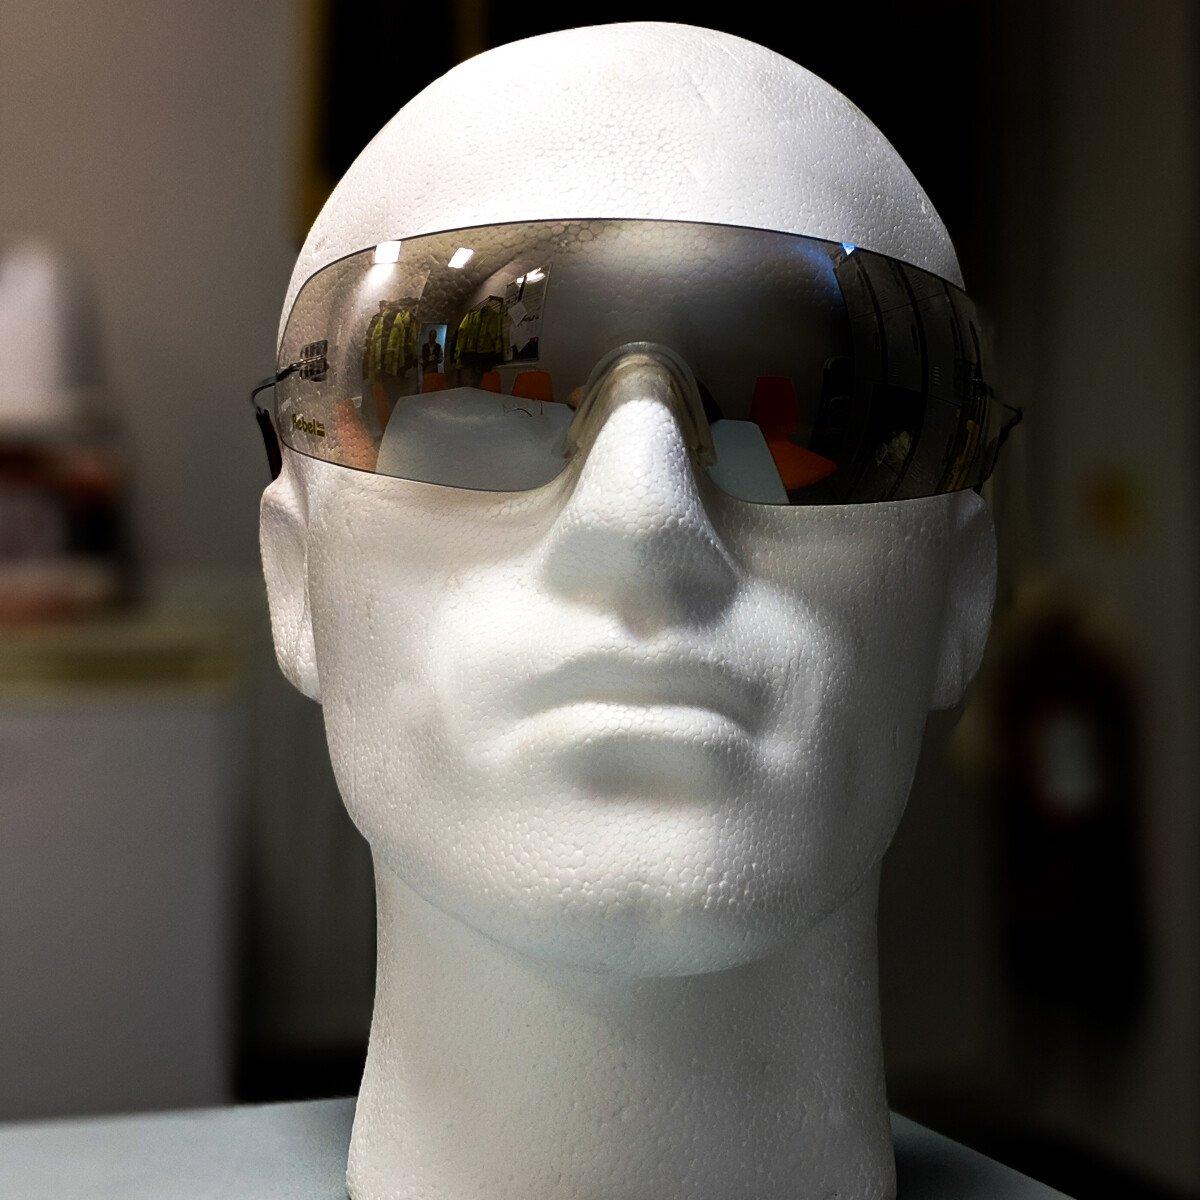 JSP Rebel I/O Clear Safety Spectacle, Wraparound Design with Soft Nose Bridge. UV Protect.